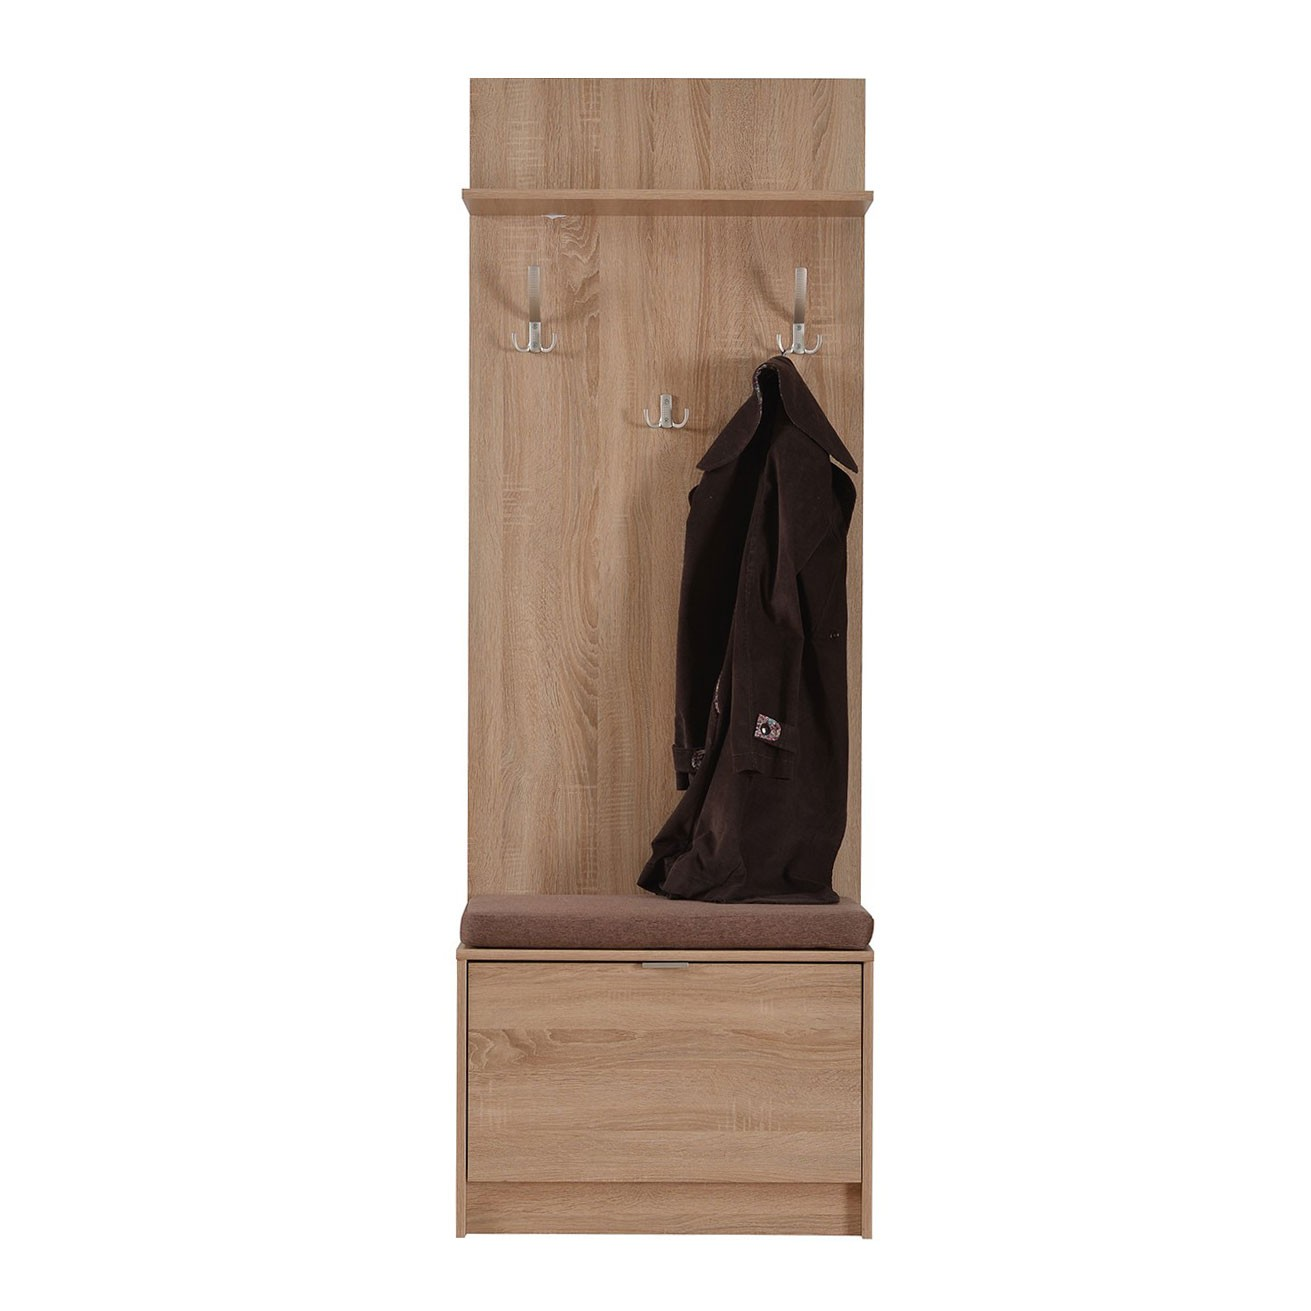 Cuier hol Flamenco cu 8 agatatori si pantofar, stejar sonoma, 670 x 350 x 1915 mm, 3C